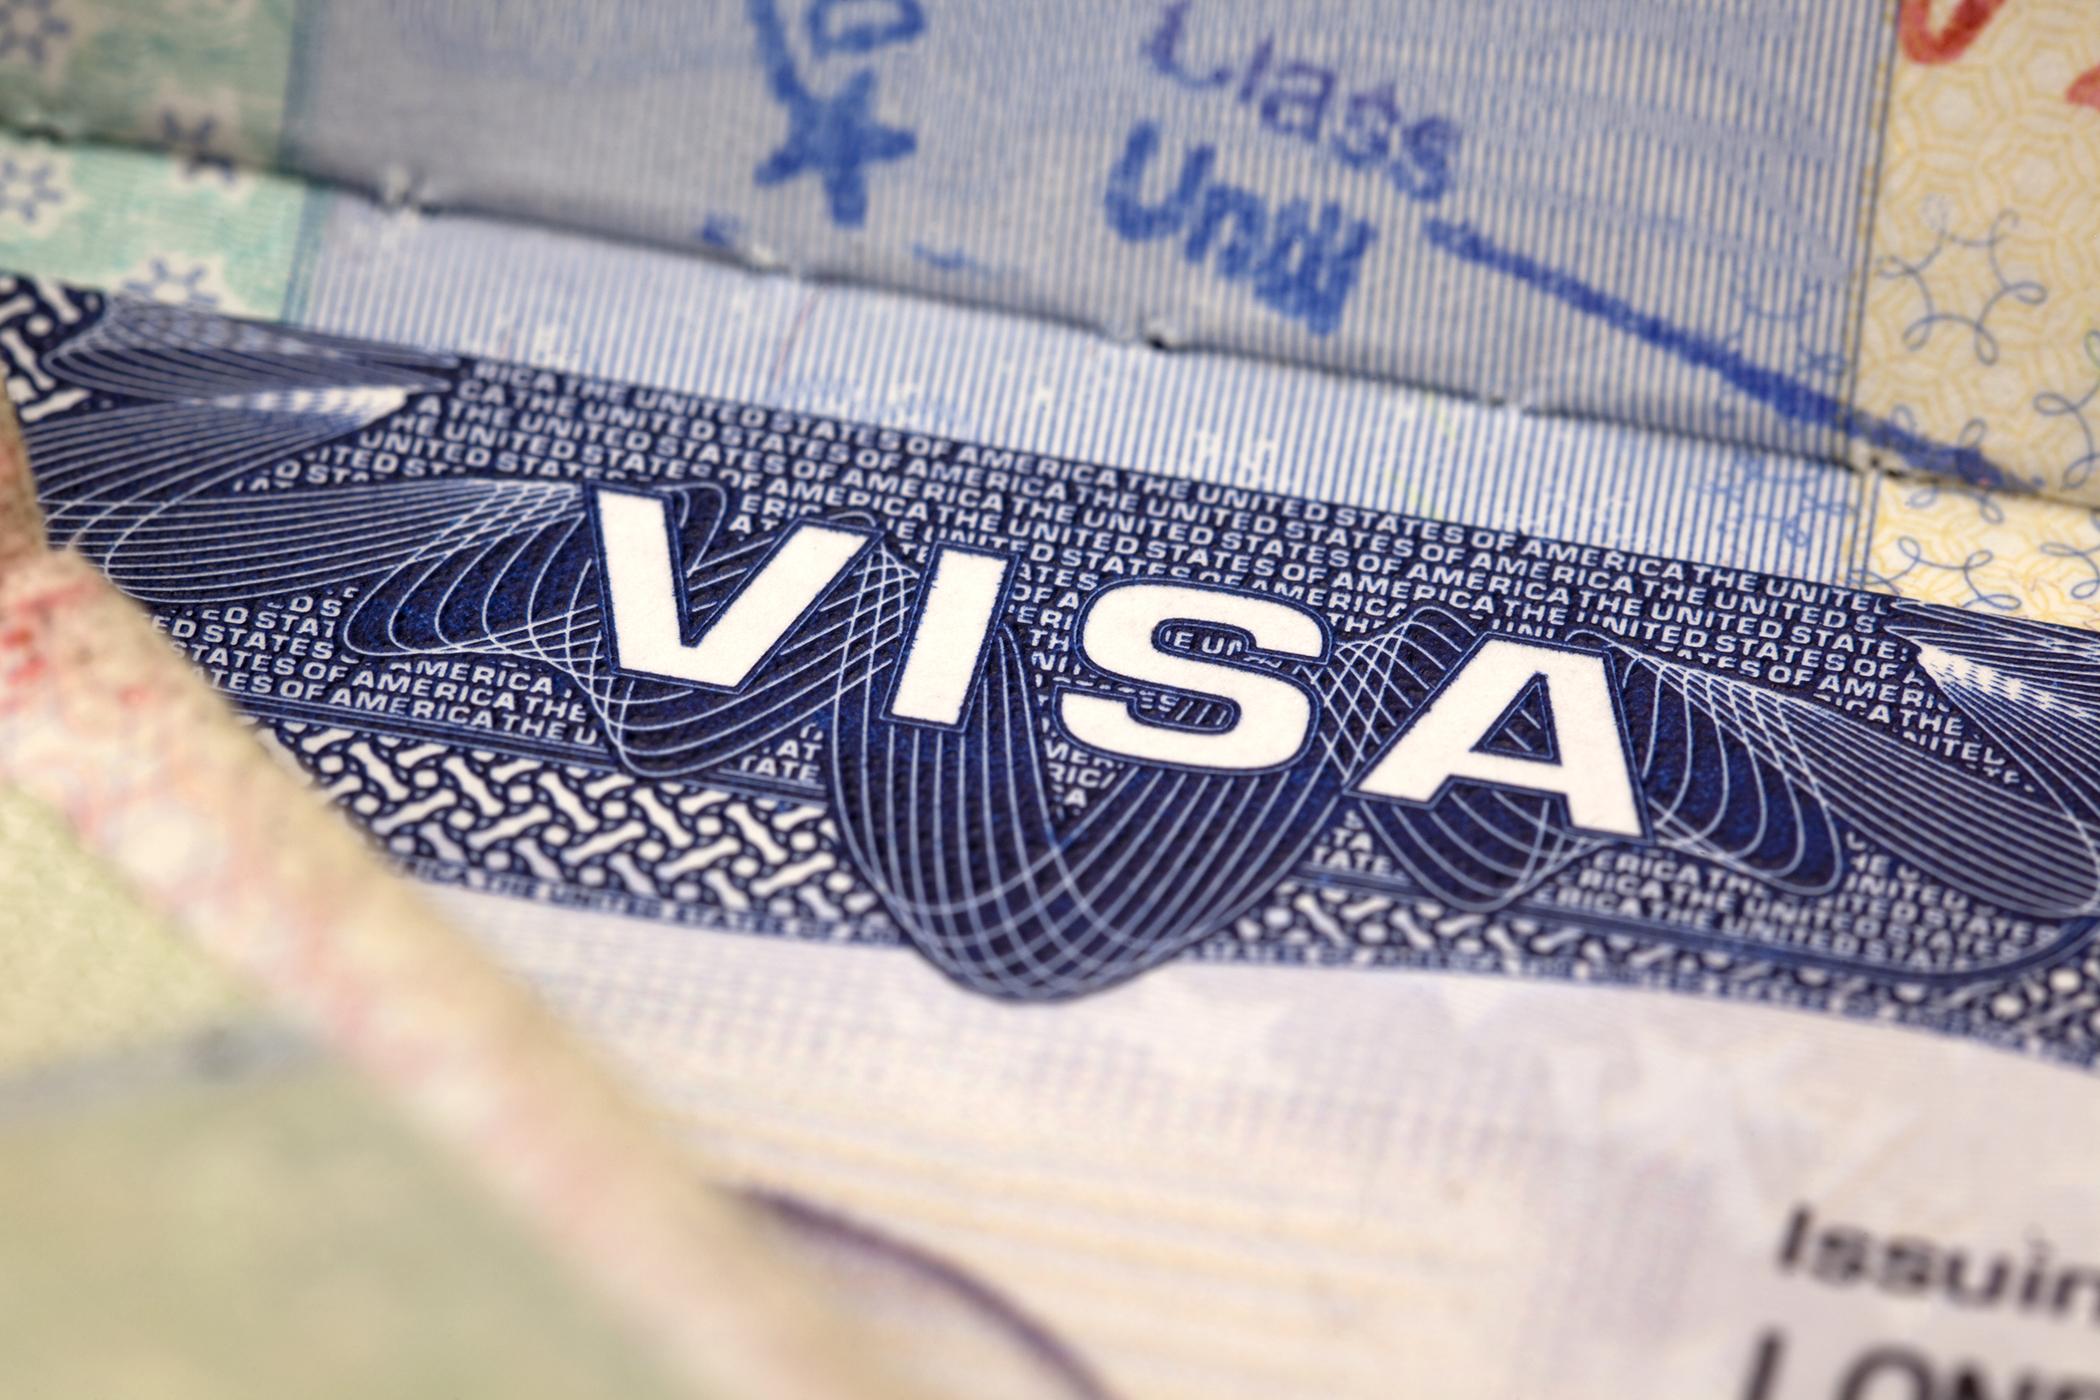 Queltypede visa pour uninvestisseur international quisouhaite s'installer aux Etats-Unis ?